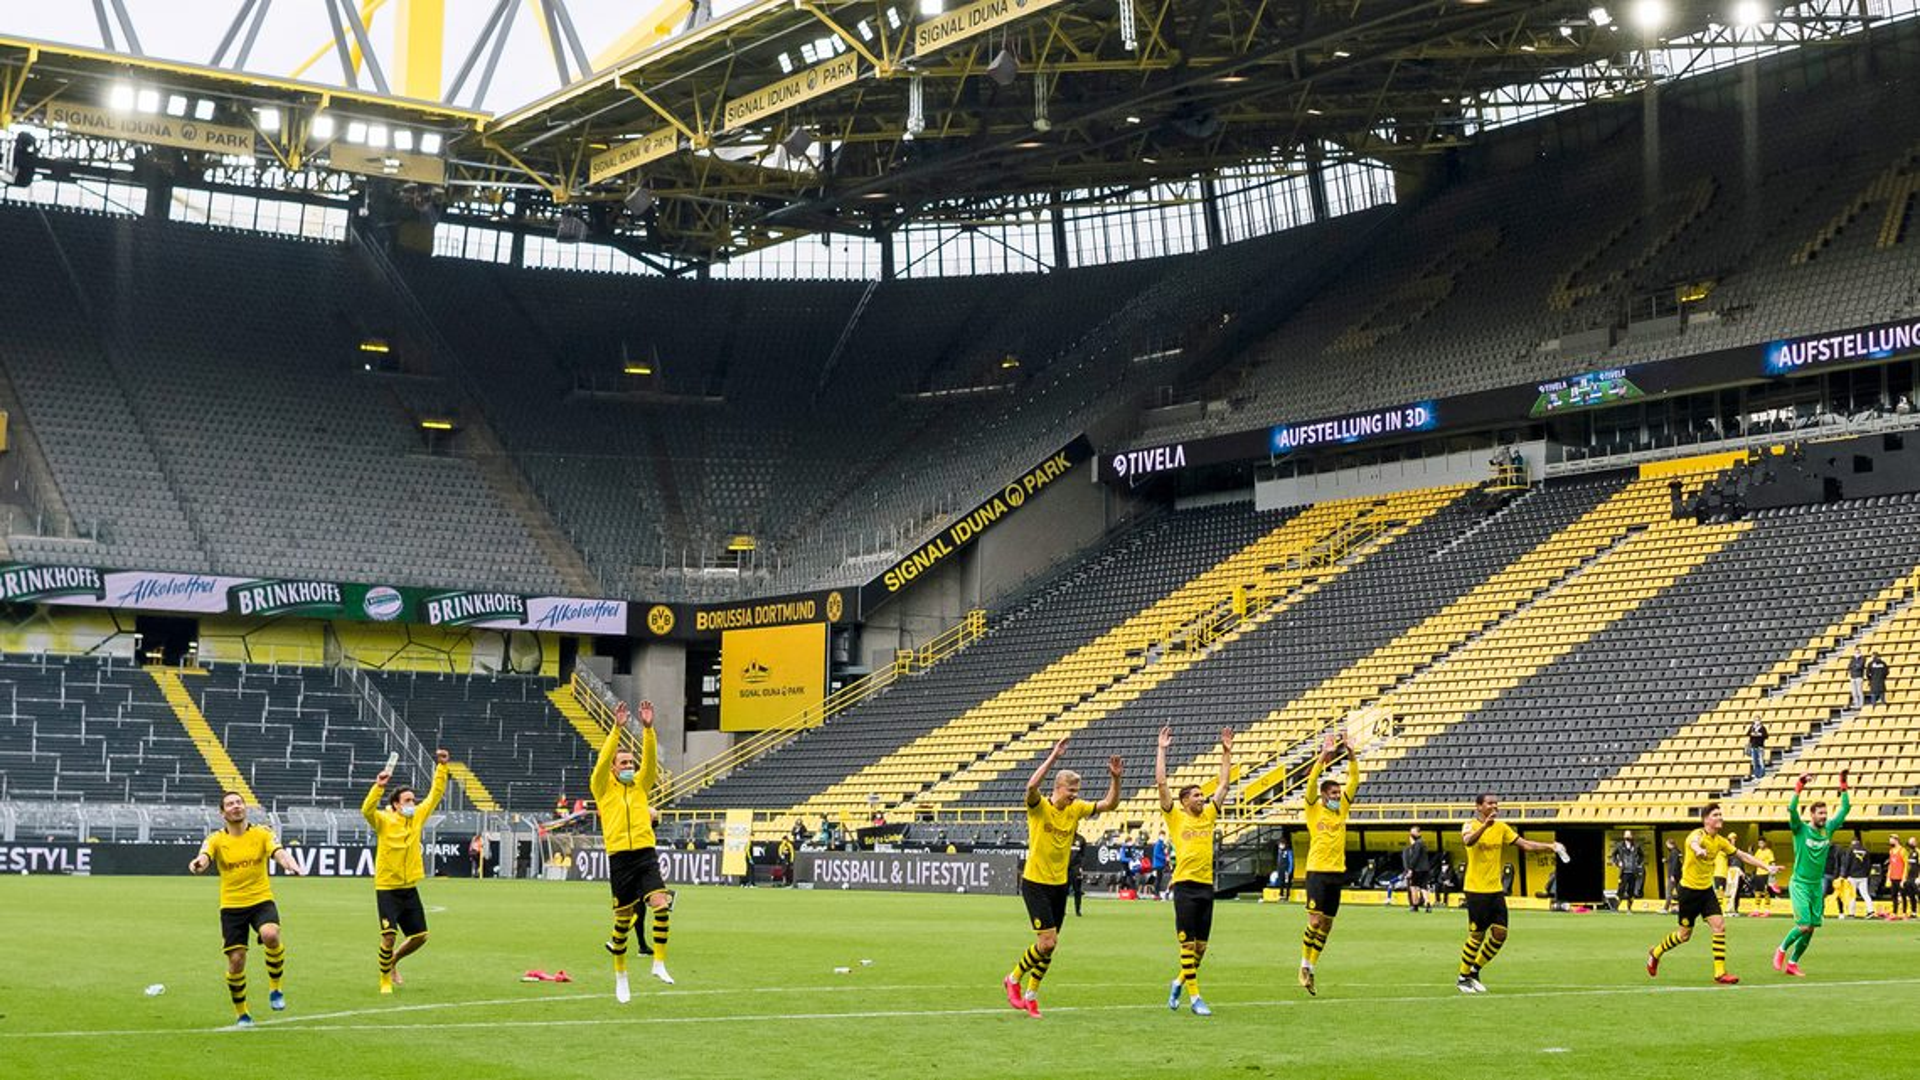 dortmund team celebration yellow wall bvb s04 - Brilliant Borussia and Sloppy Schalke: Match Report: Borussia Dortmund 4 – 0 Schalke 04